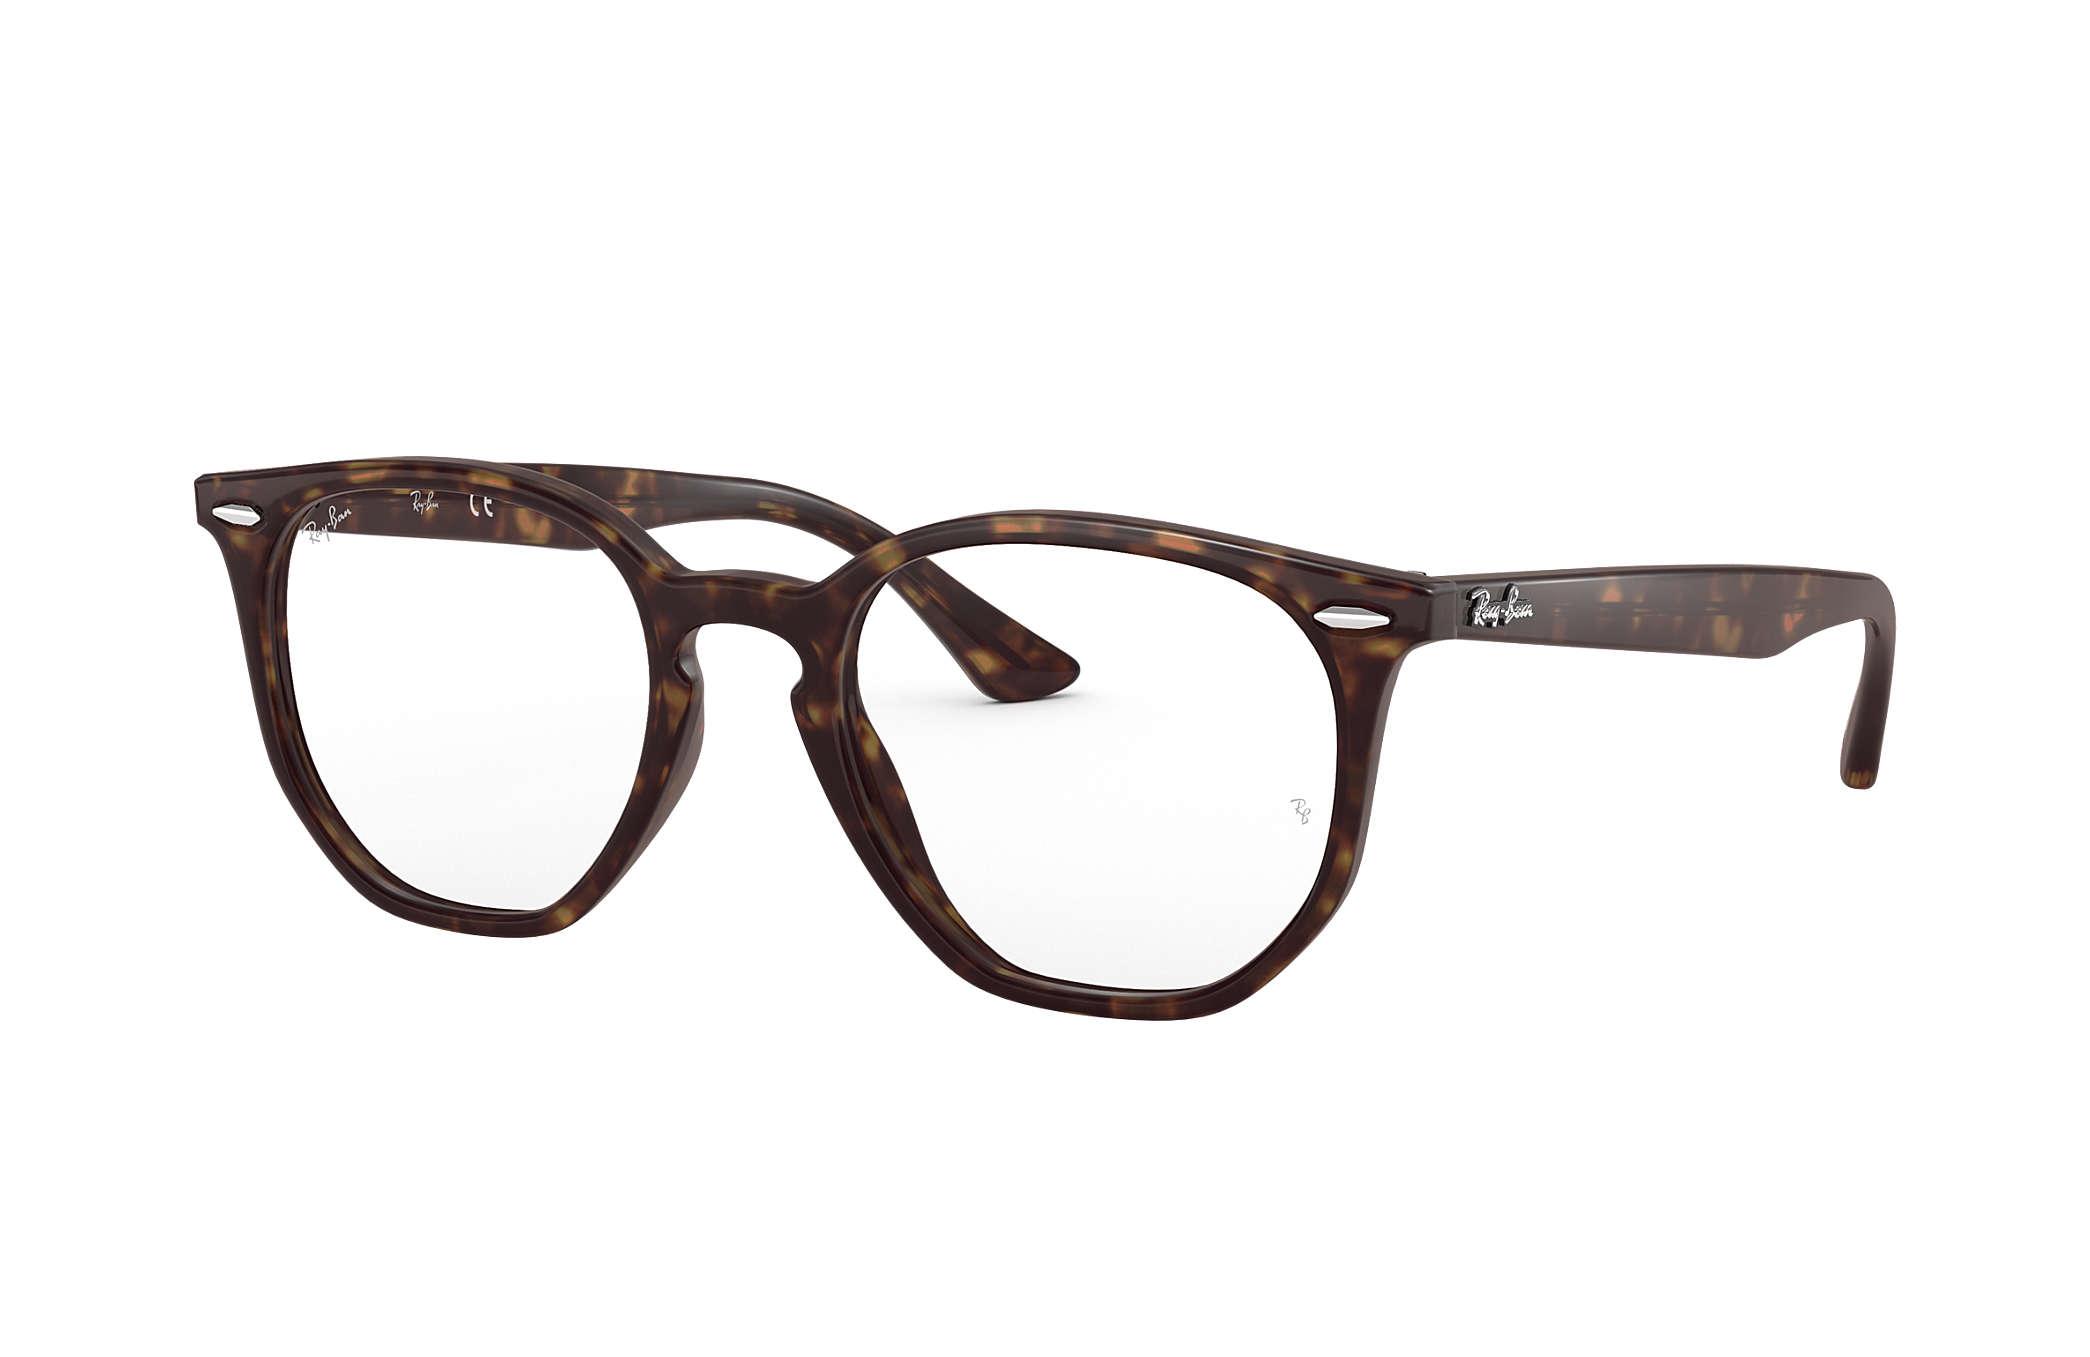 836e076ec Óculos de grau Ray-Ban Hexagonal Optics RB7151 Tartaruga - Acetato ...